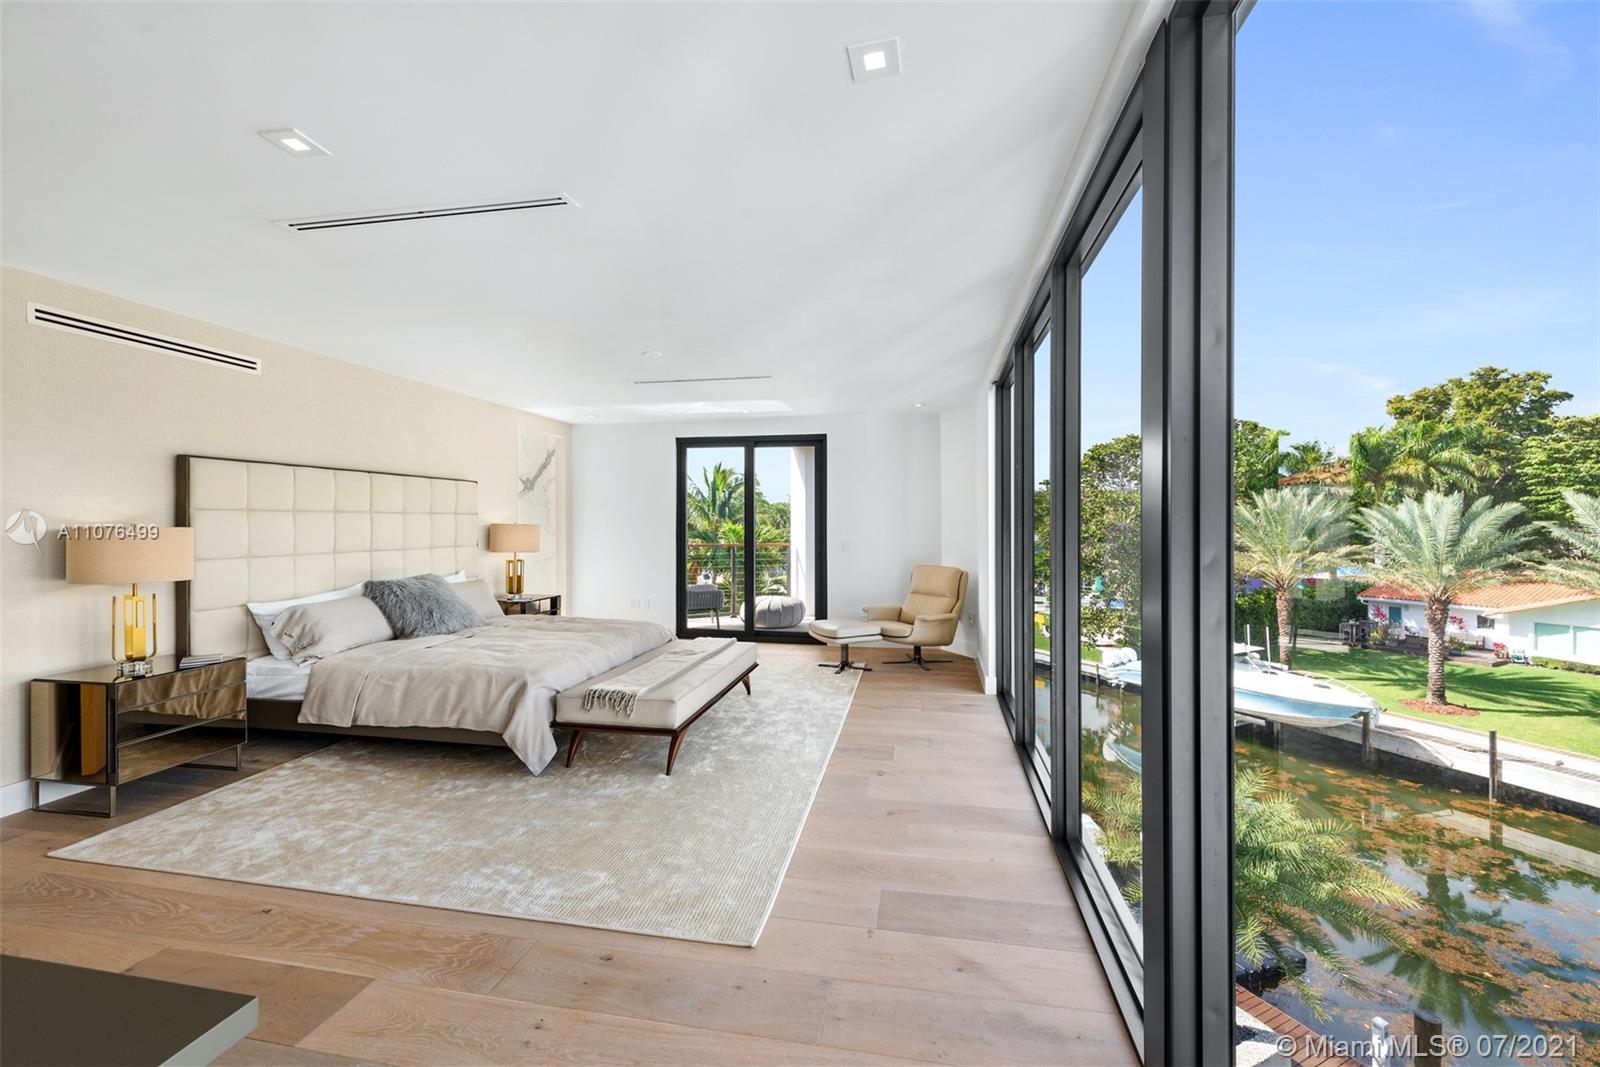 Photo of 1755 Fairhaven Pl, Home